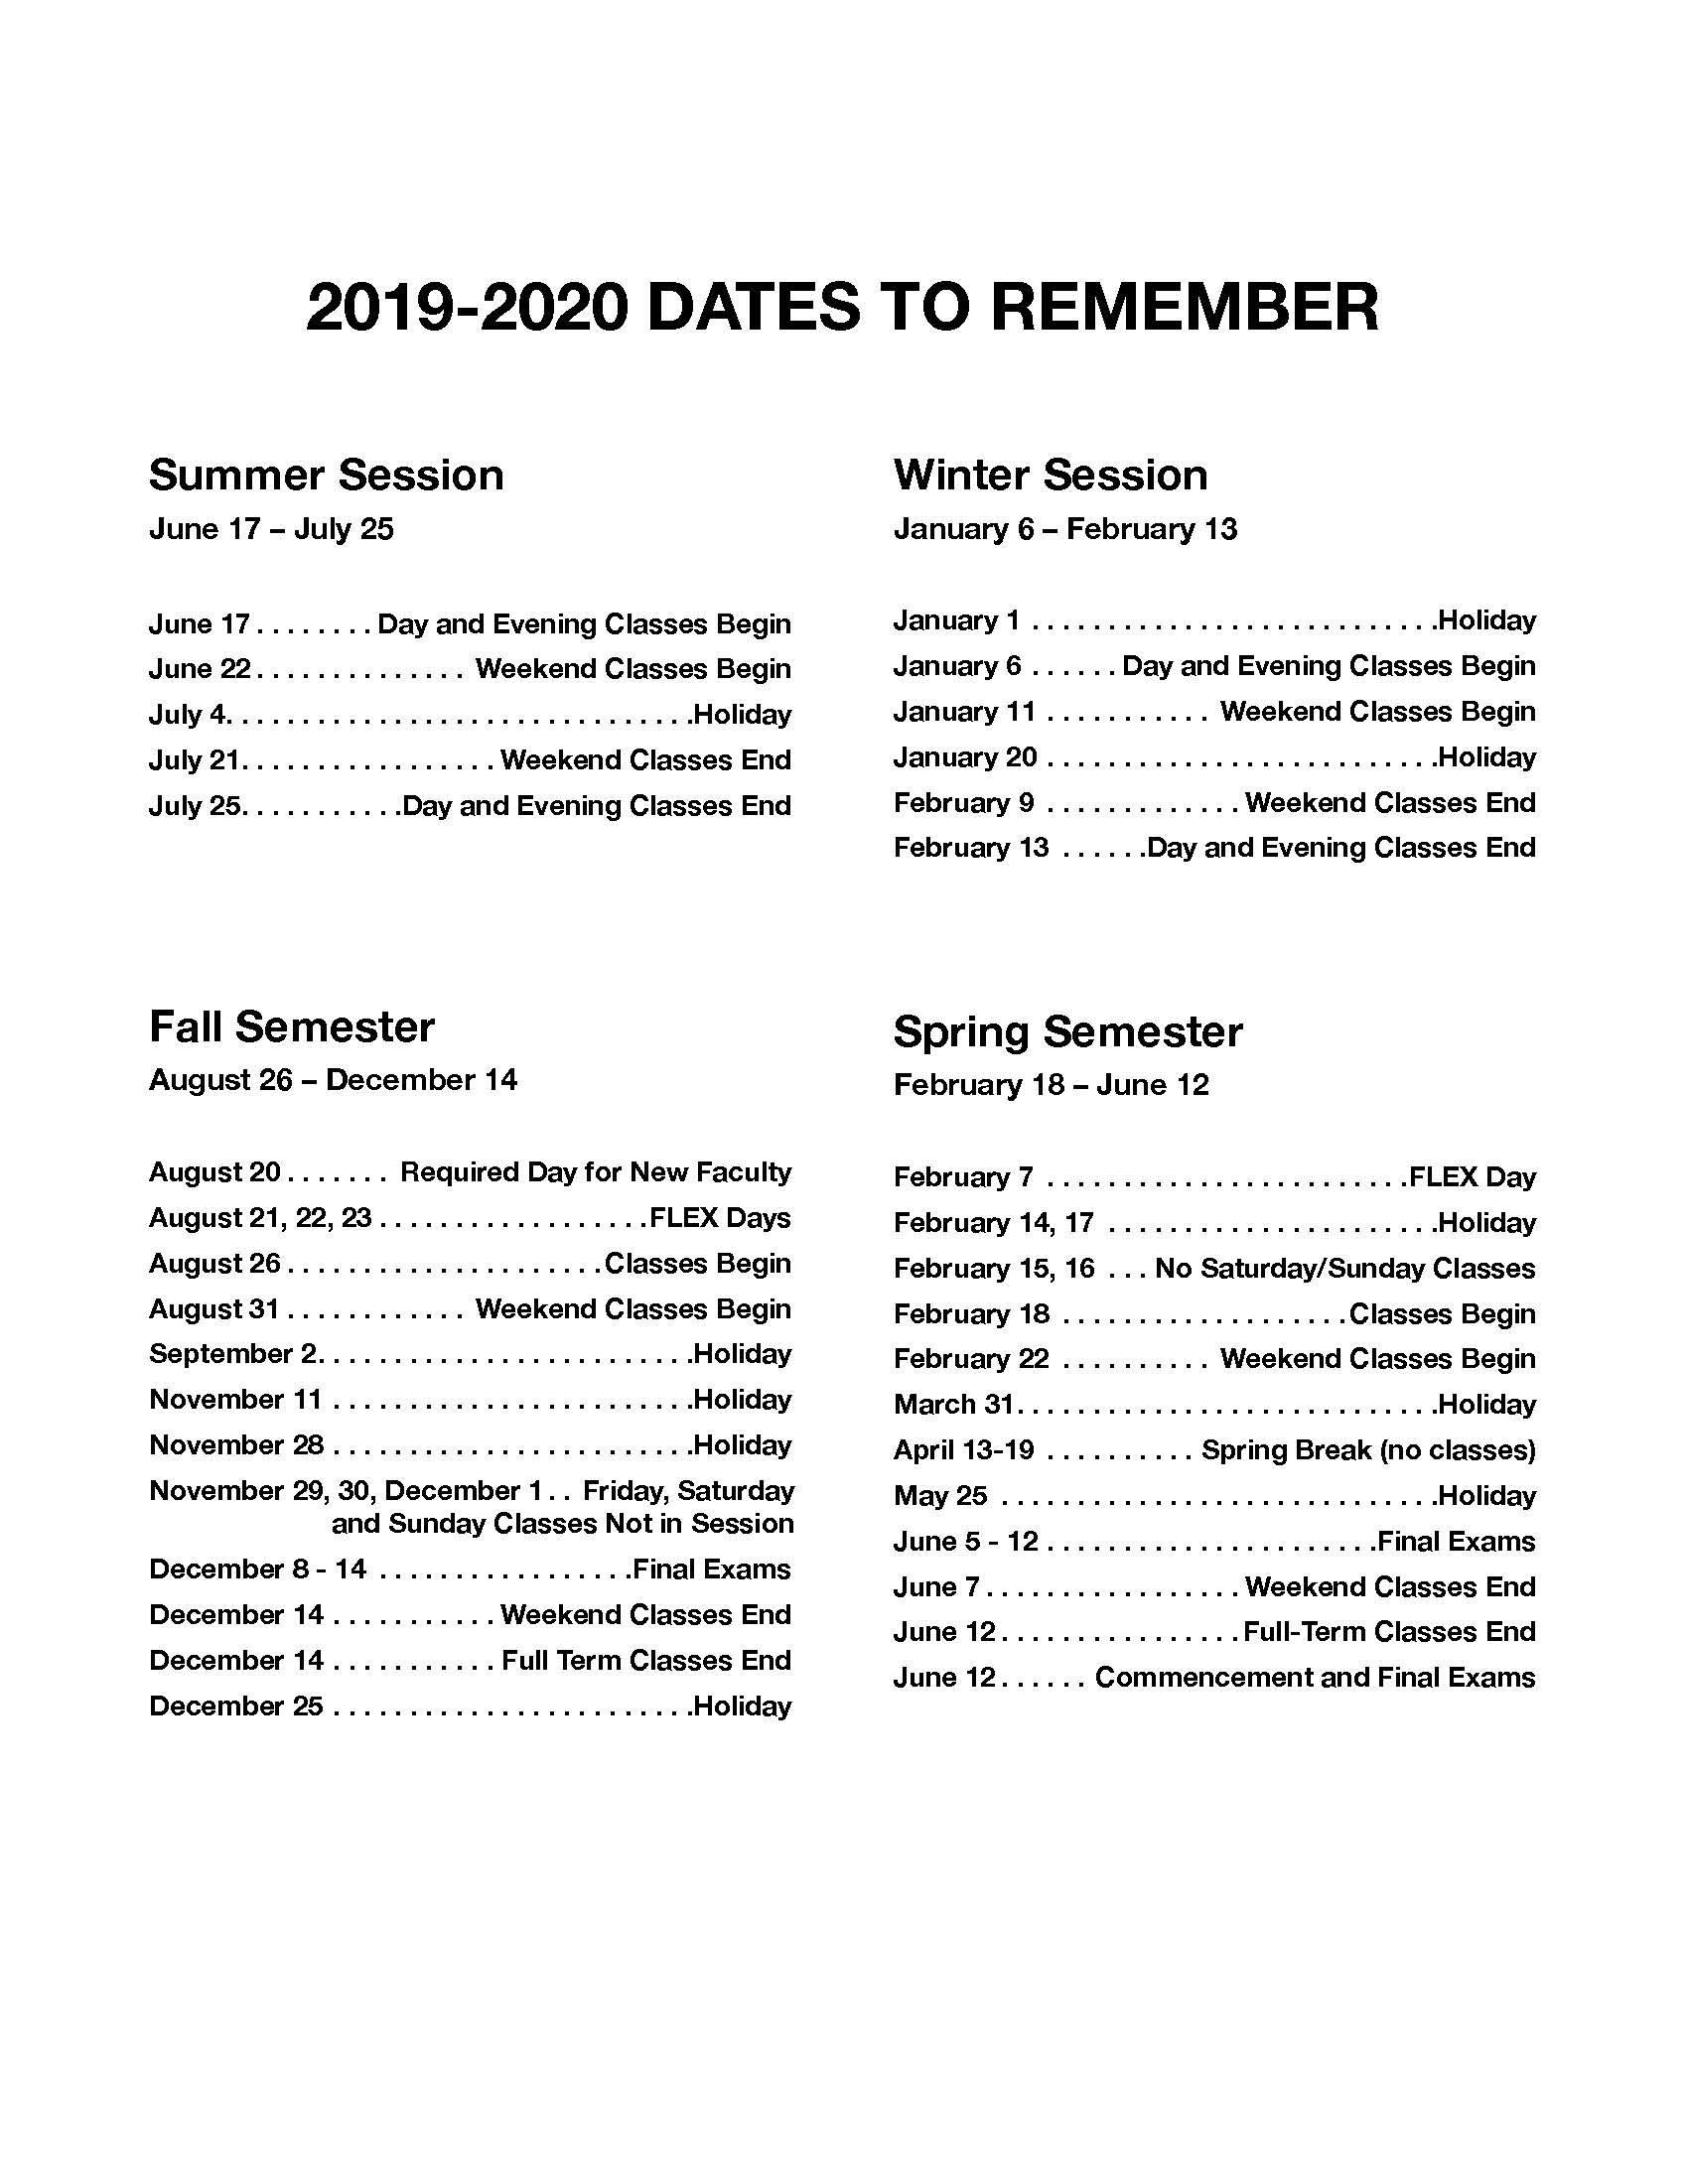 Jfk And Norco College Calendar 2019 2020 – John F. Kennedy Intended For Corona Norco Usd Calendar